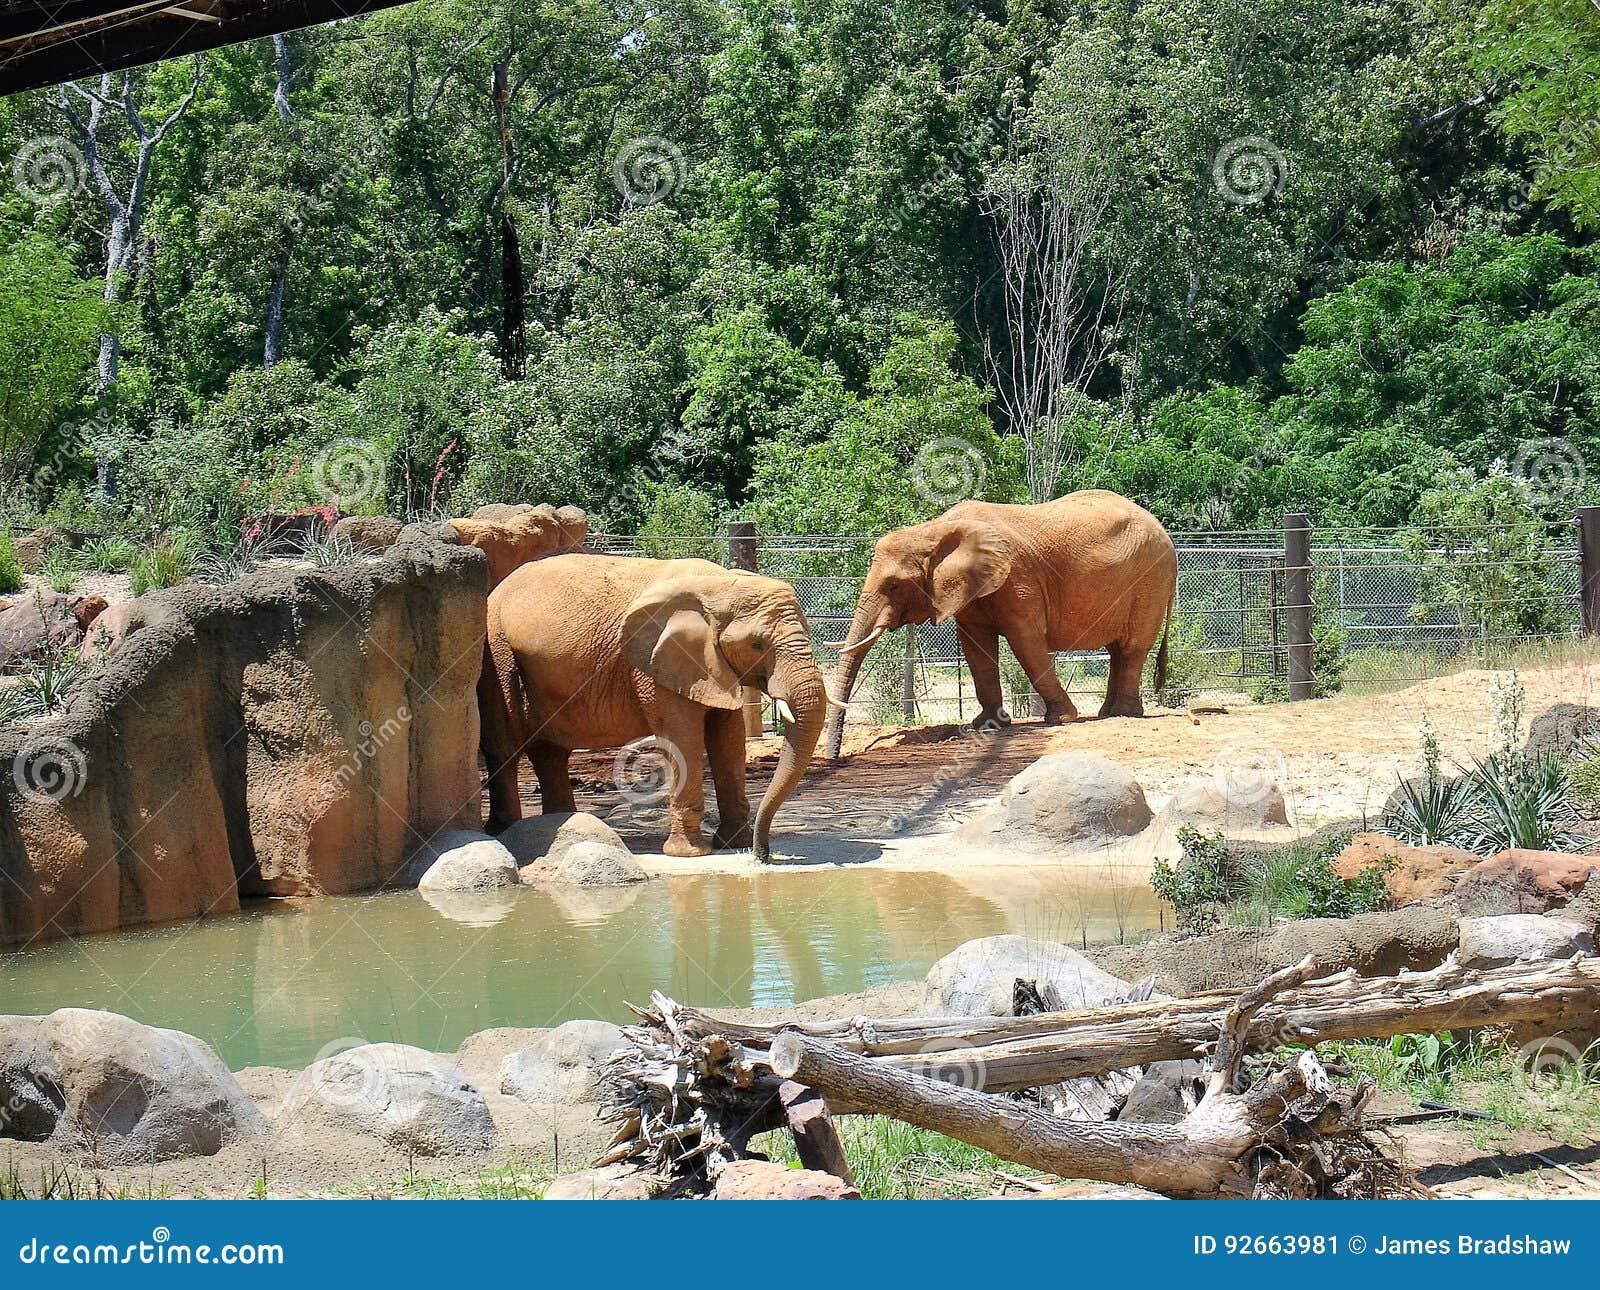 Elephants at zoo